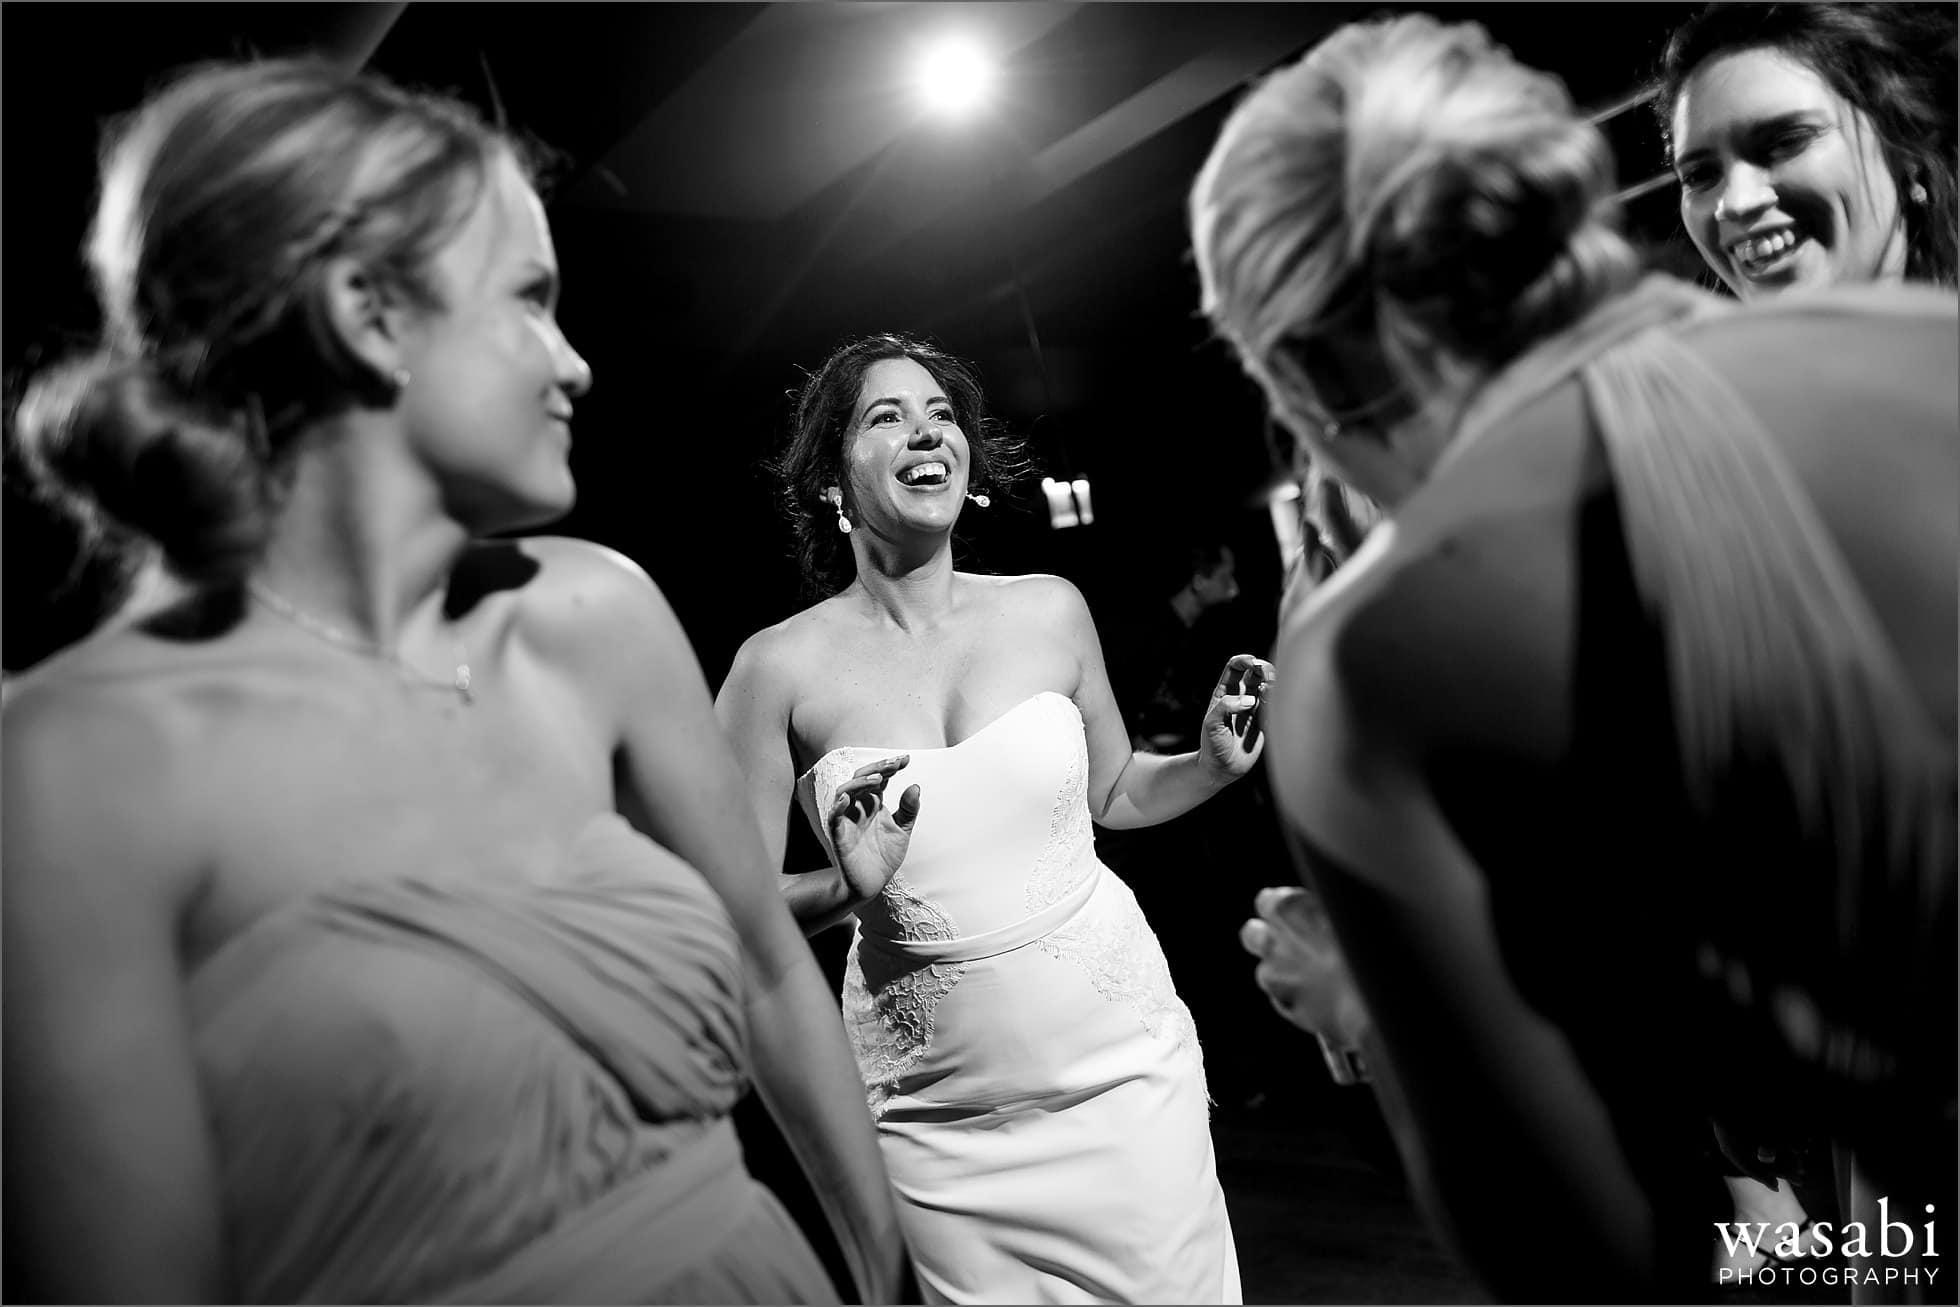 tribune tower howells and hood dancing wedding reception